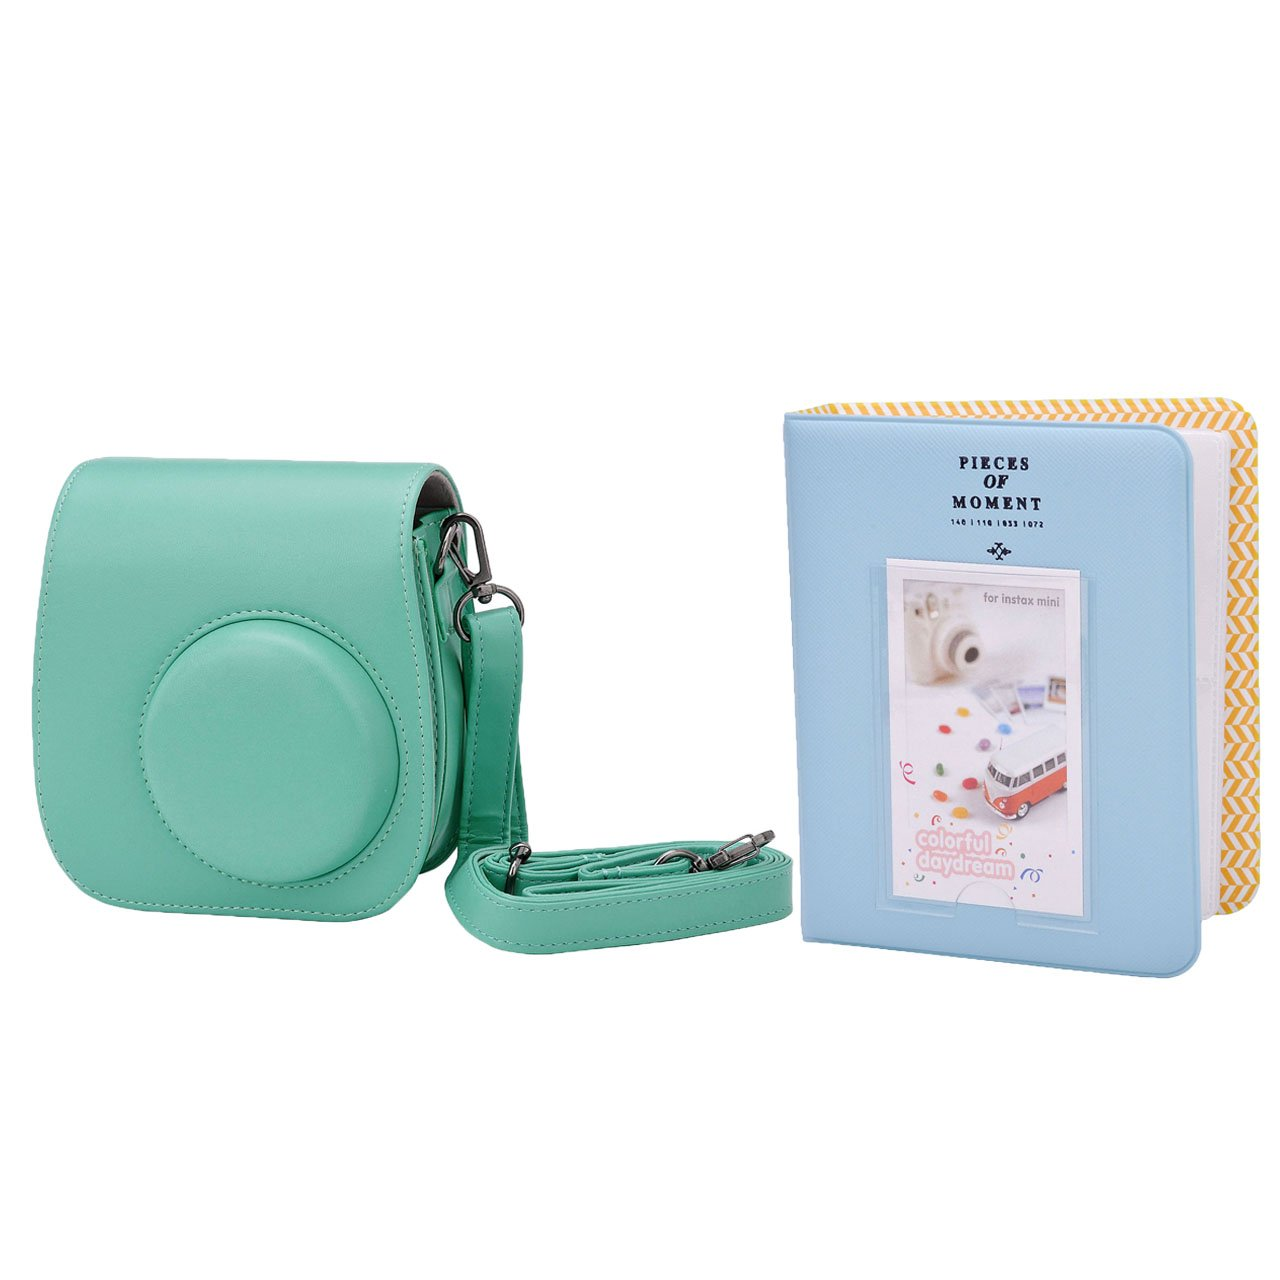 Mogoko Essential Bundle Fr Fujifilm Fuji Instax Kamera Mini Album Polaroid 2nan Colorful